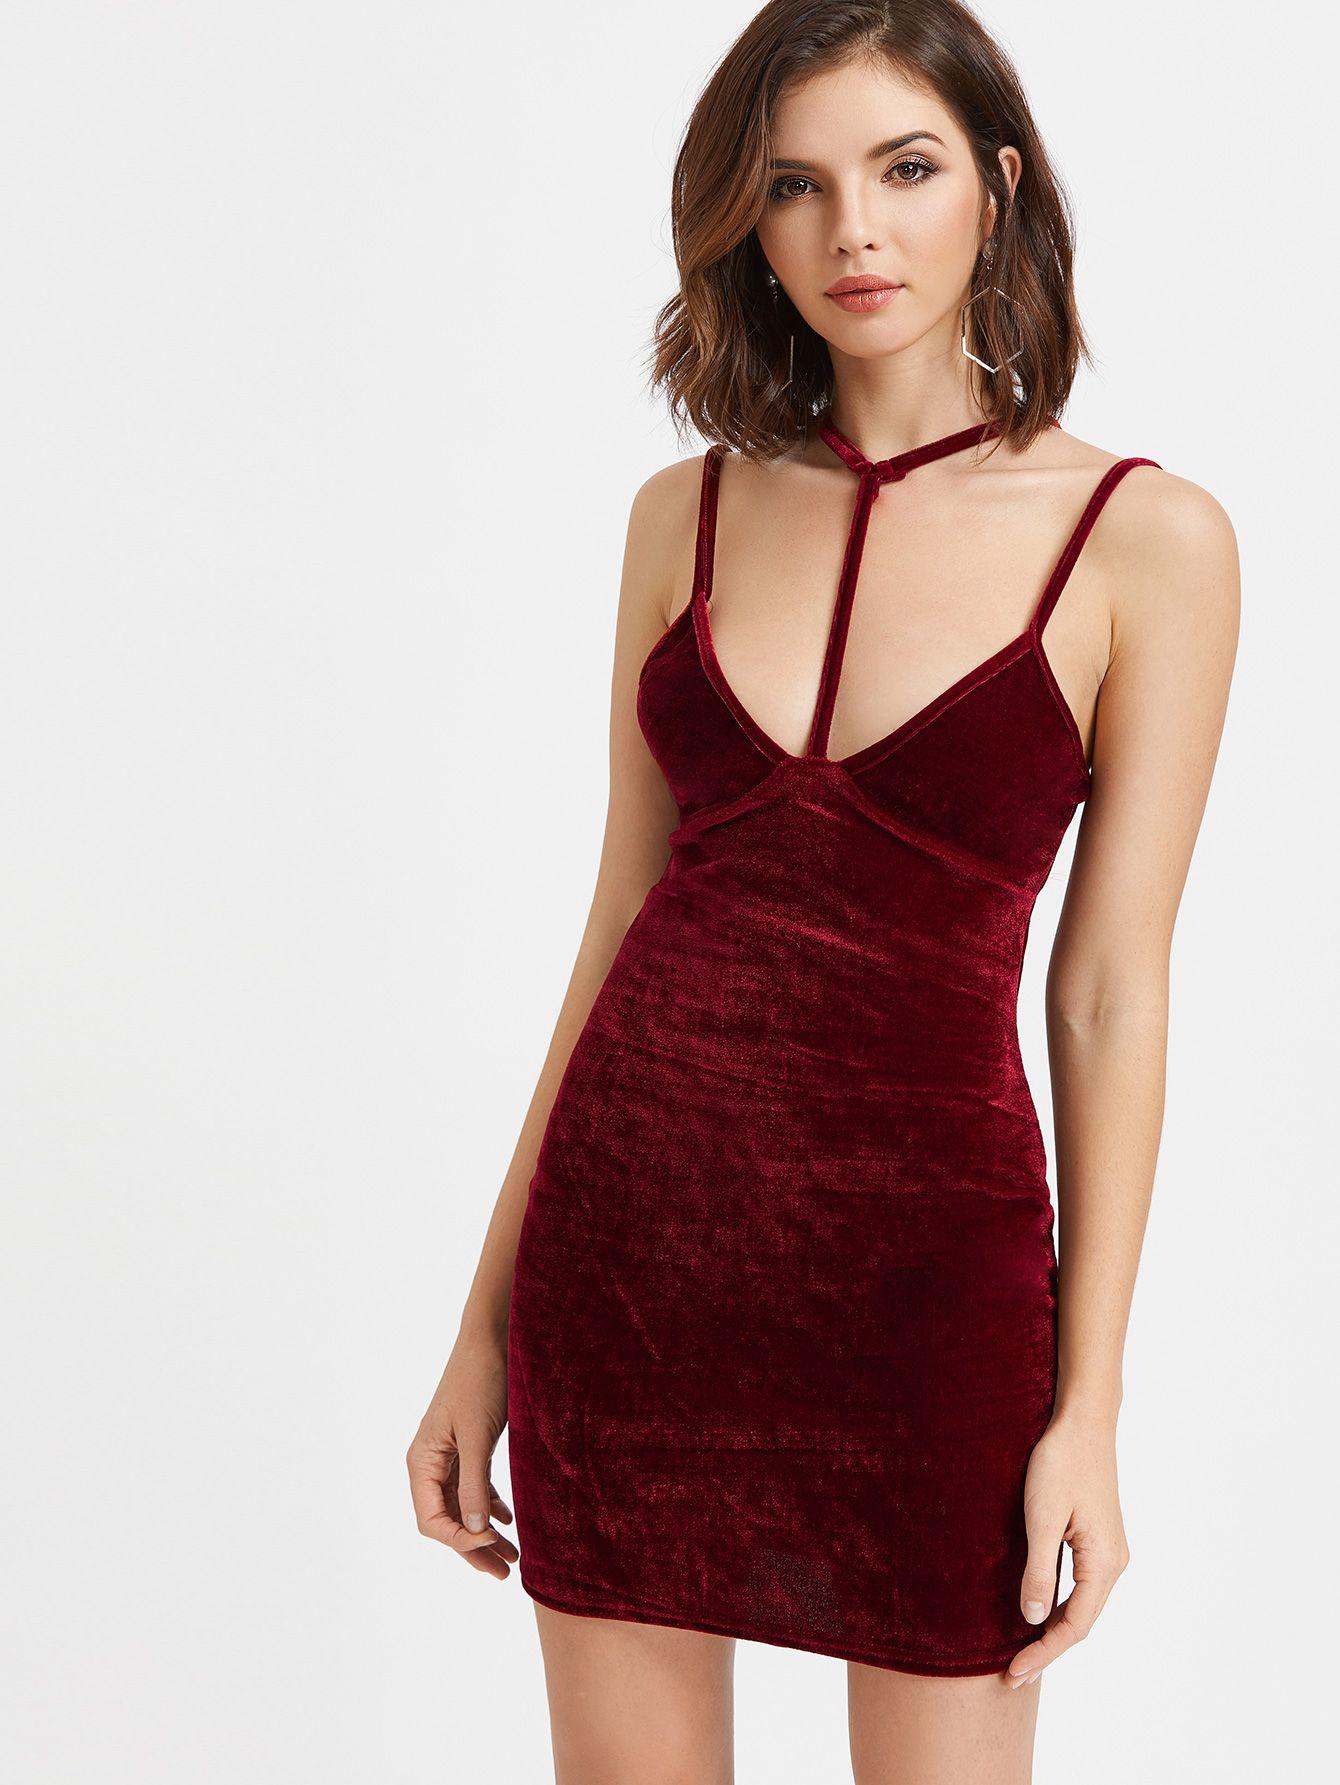 Burgundy velvet shorts bnwot size 12 uk women/'s party club holiday party wear